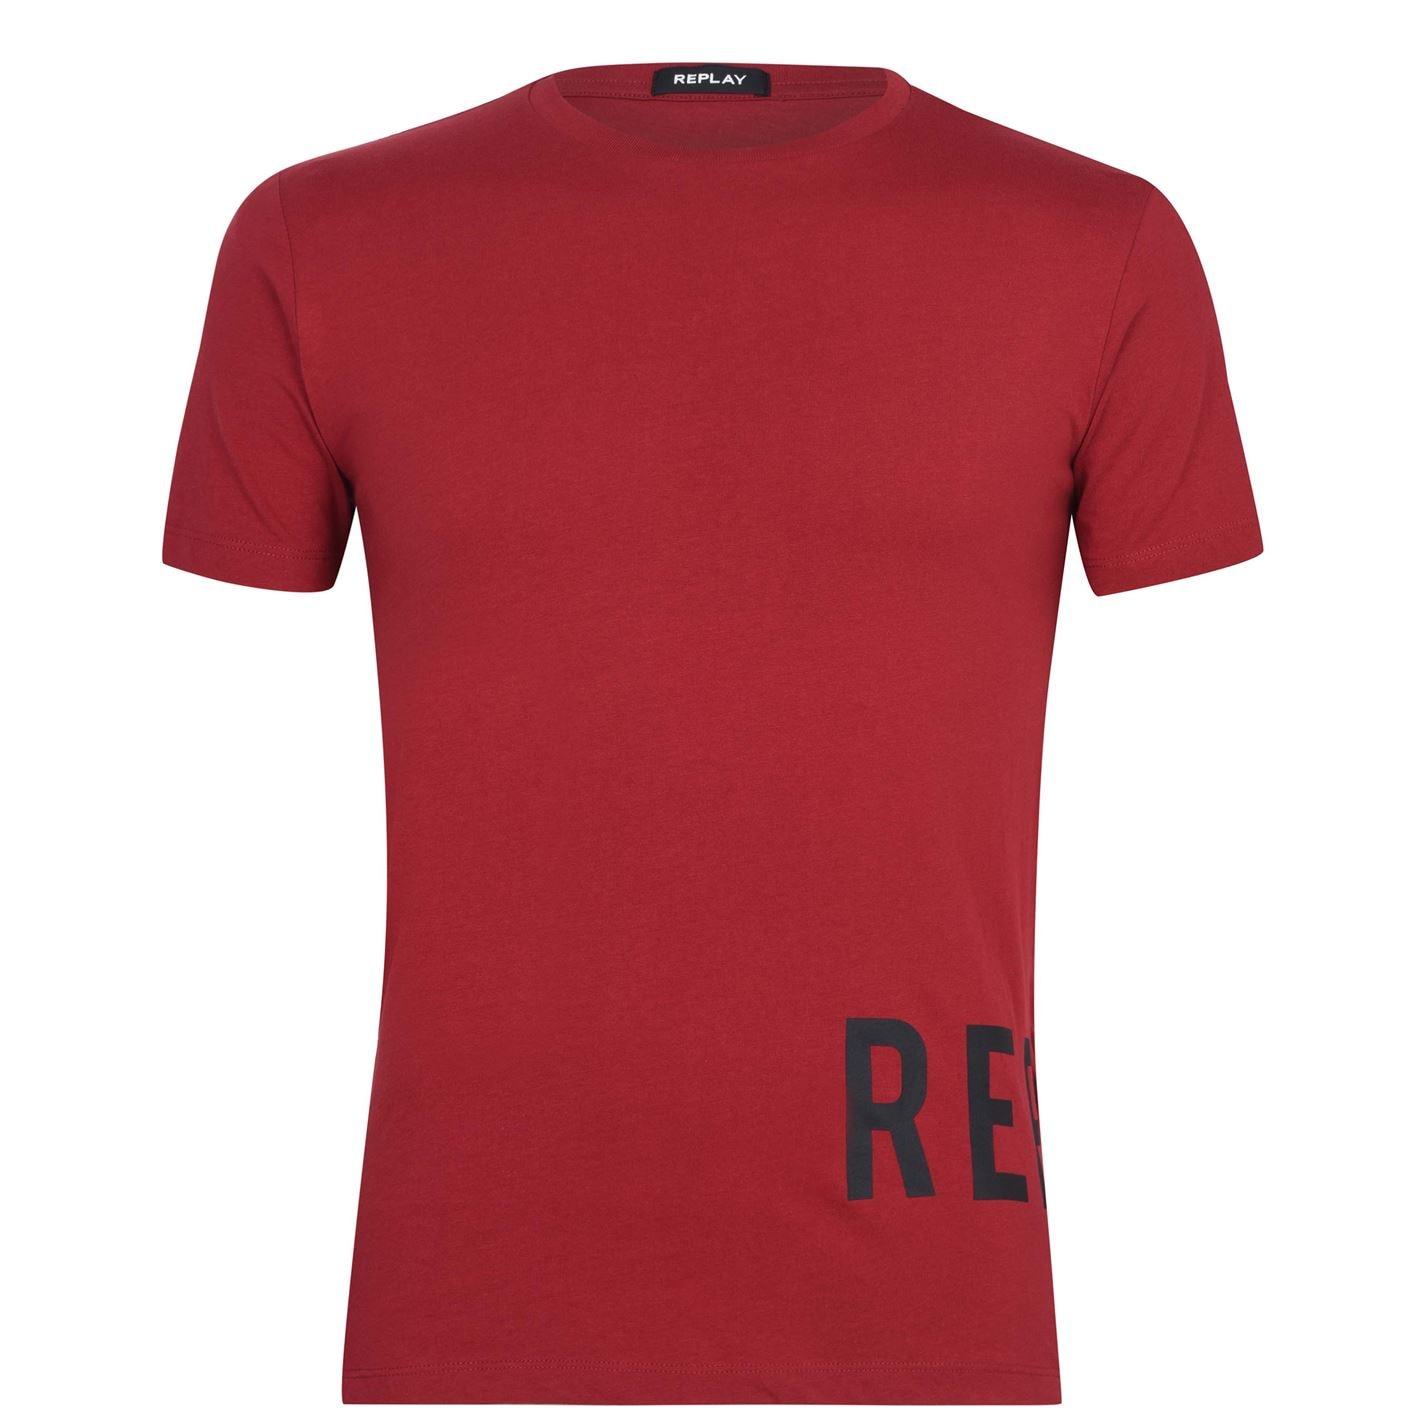 Mergi la Tricou Replay Rep inchis rosu